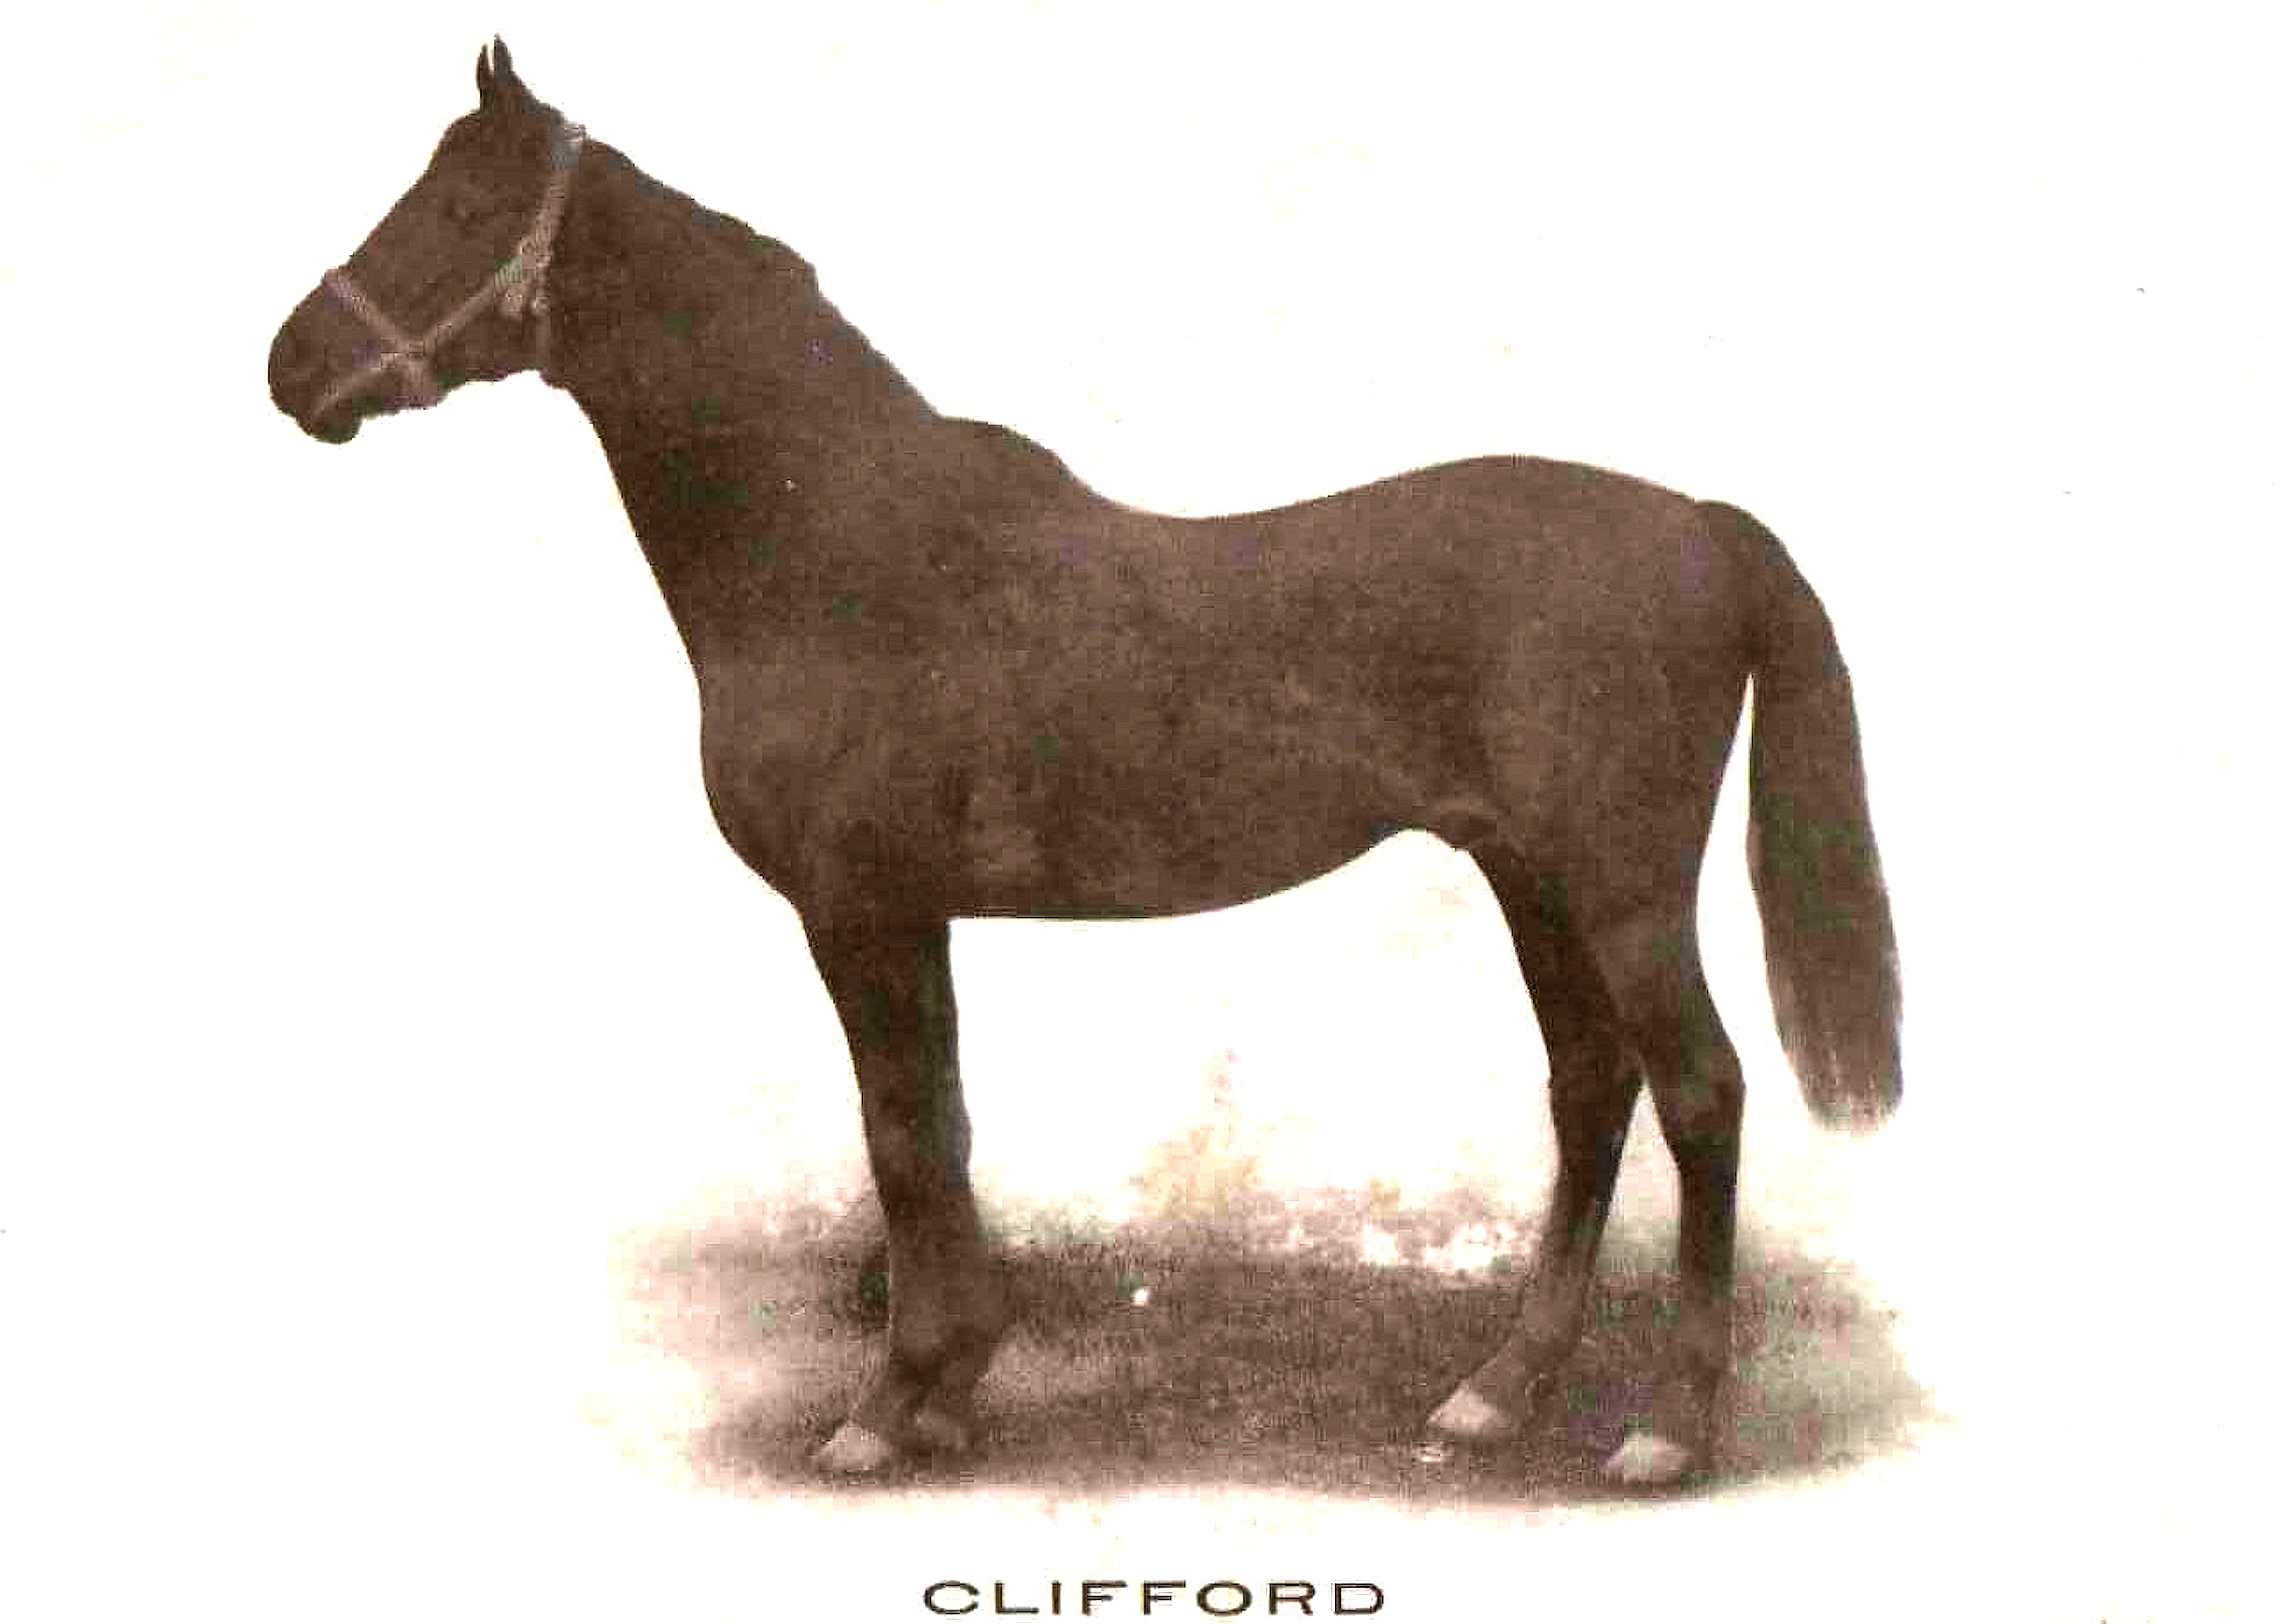 Clifford at Hurricana Farm (Courtesy of Friends of Sanford Stud Farm)